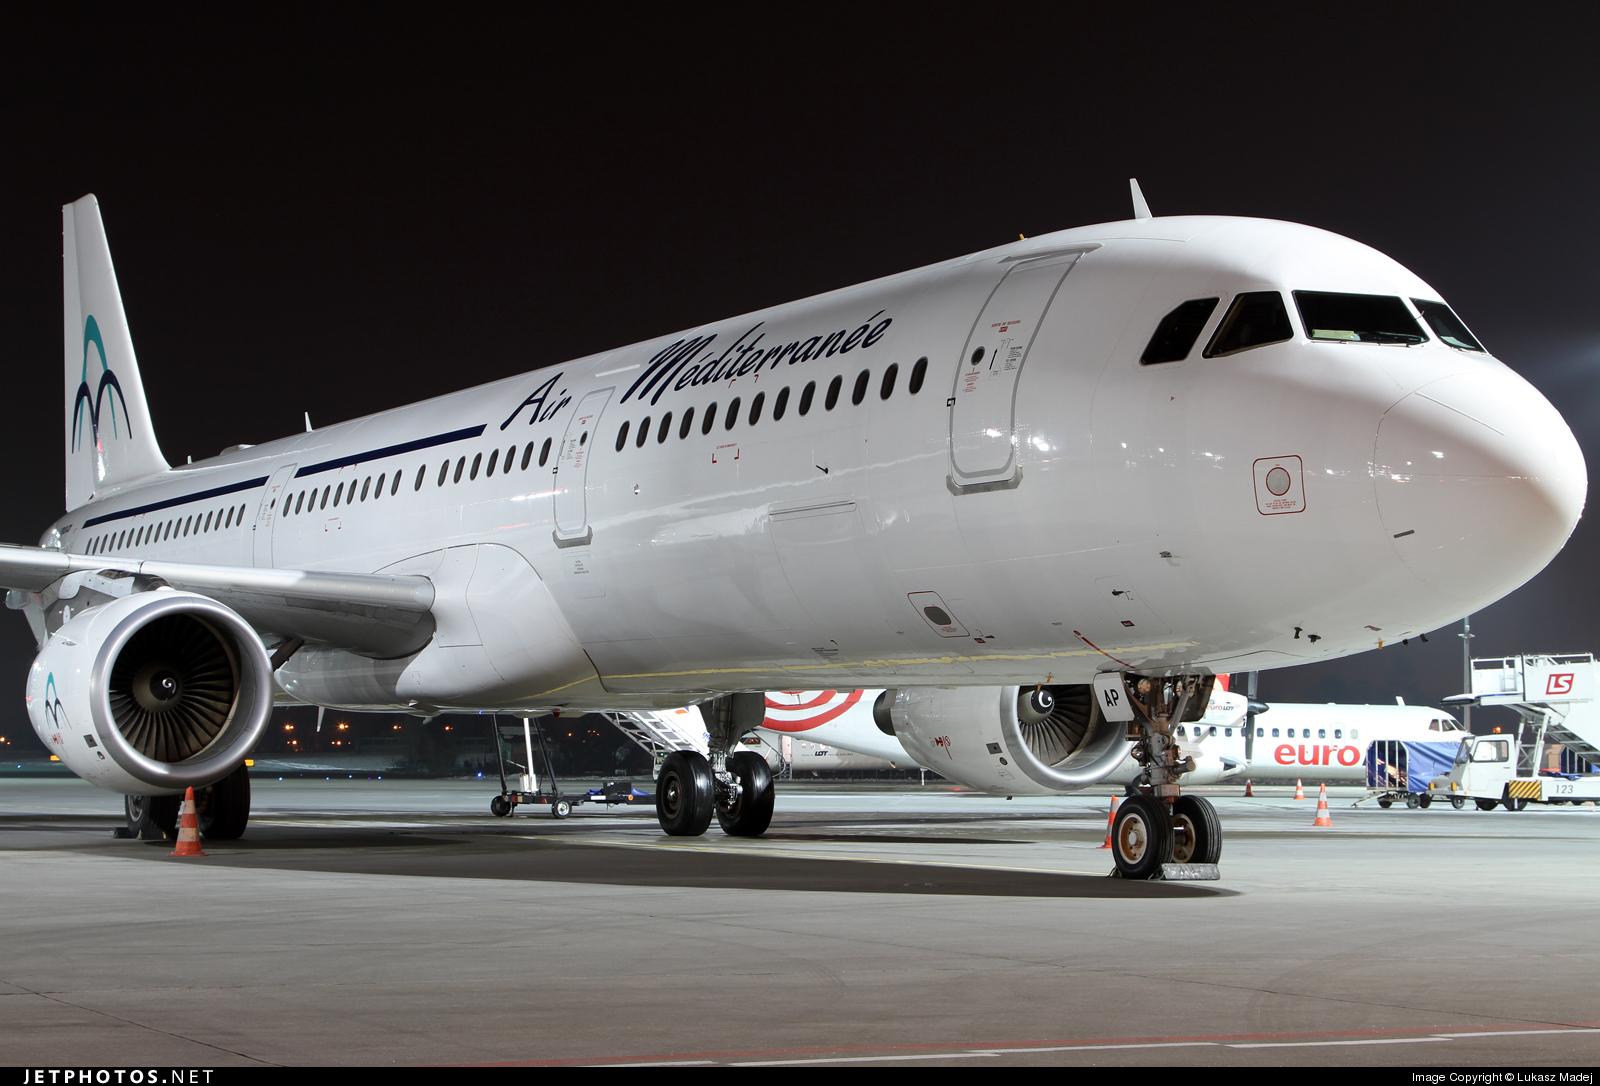 F-GYAP - Airbus A321-111 - Air Méditerranée